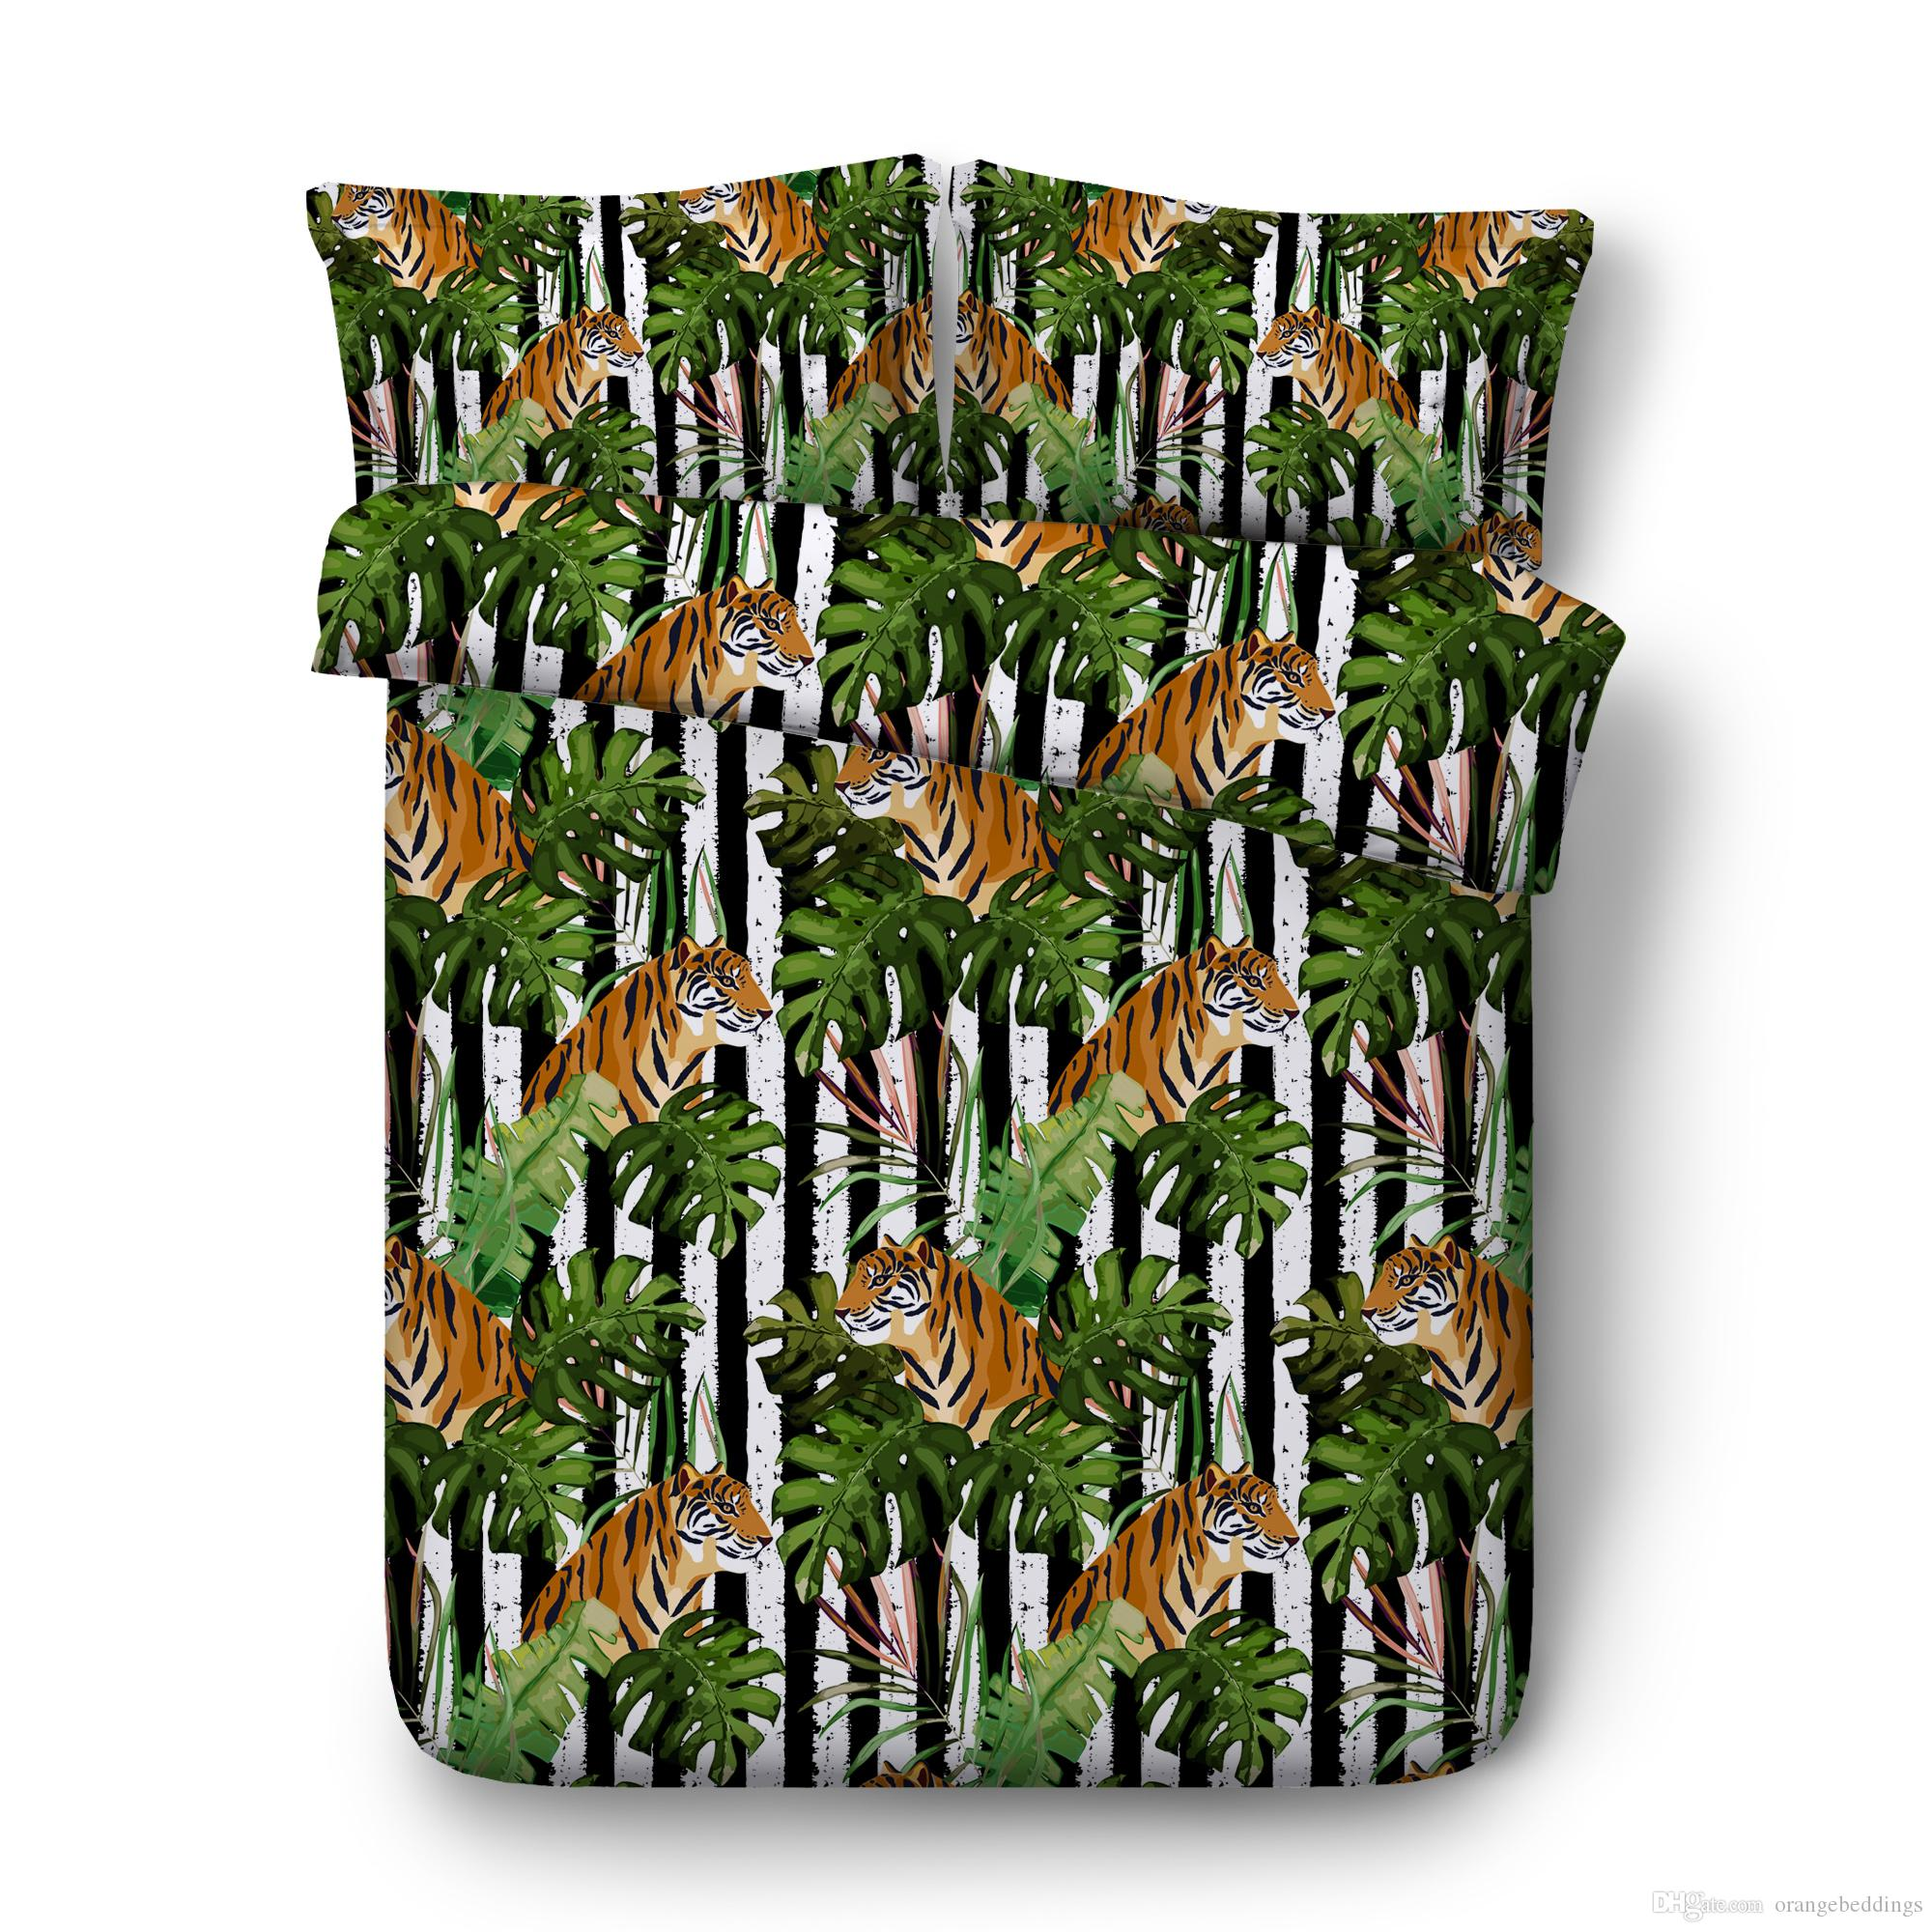 3D Tiger Print Bedding For Teens Boys Kids Girls Teens 3 Piece 2 Pillow Shams 1 Duvet Cover Home Textile Polyester Cotton No Comforter